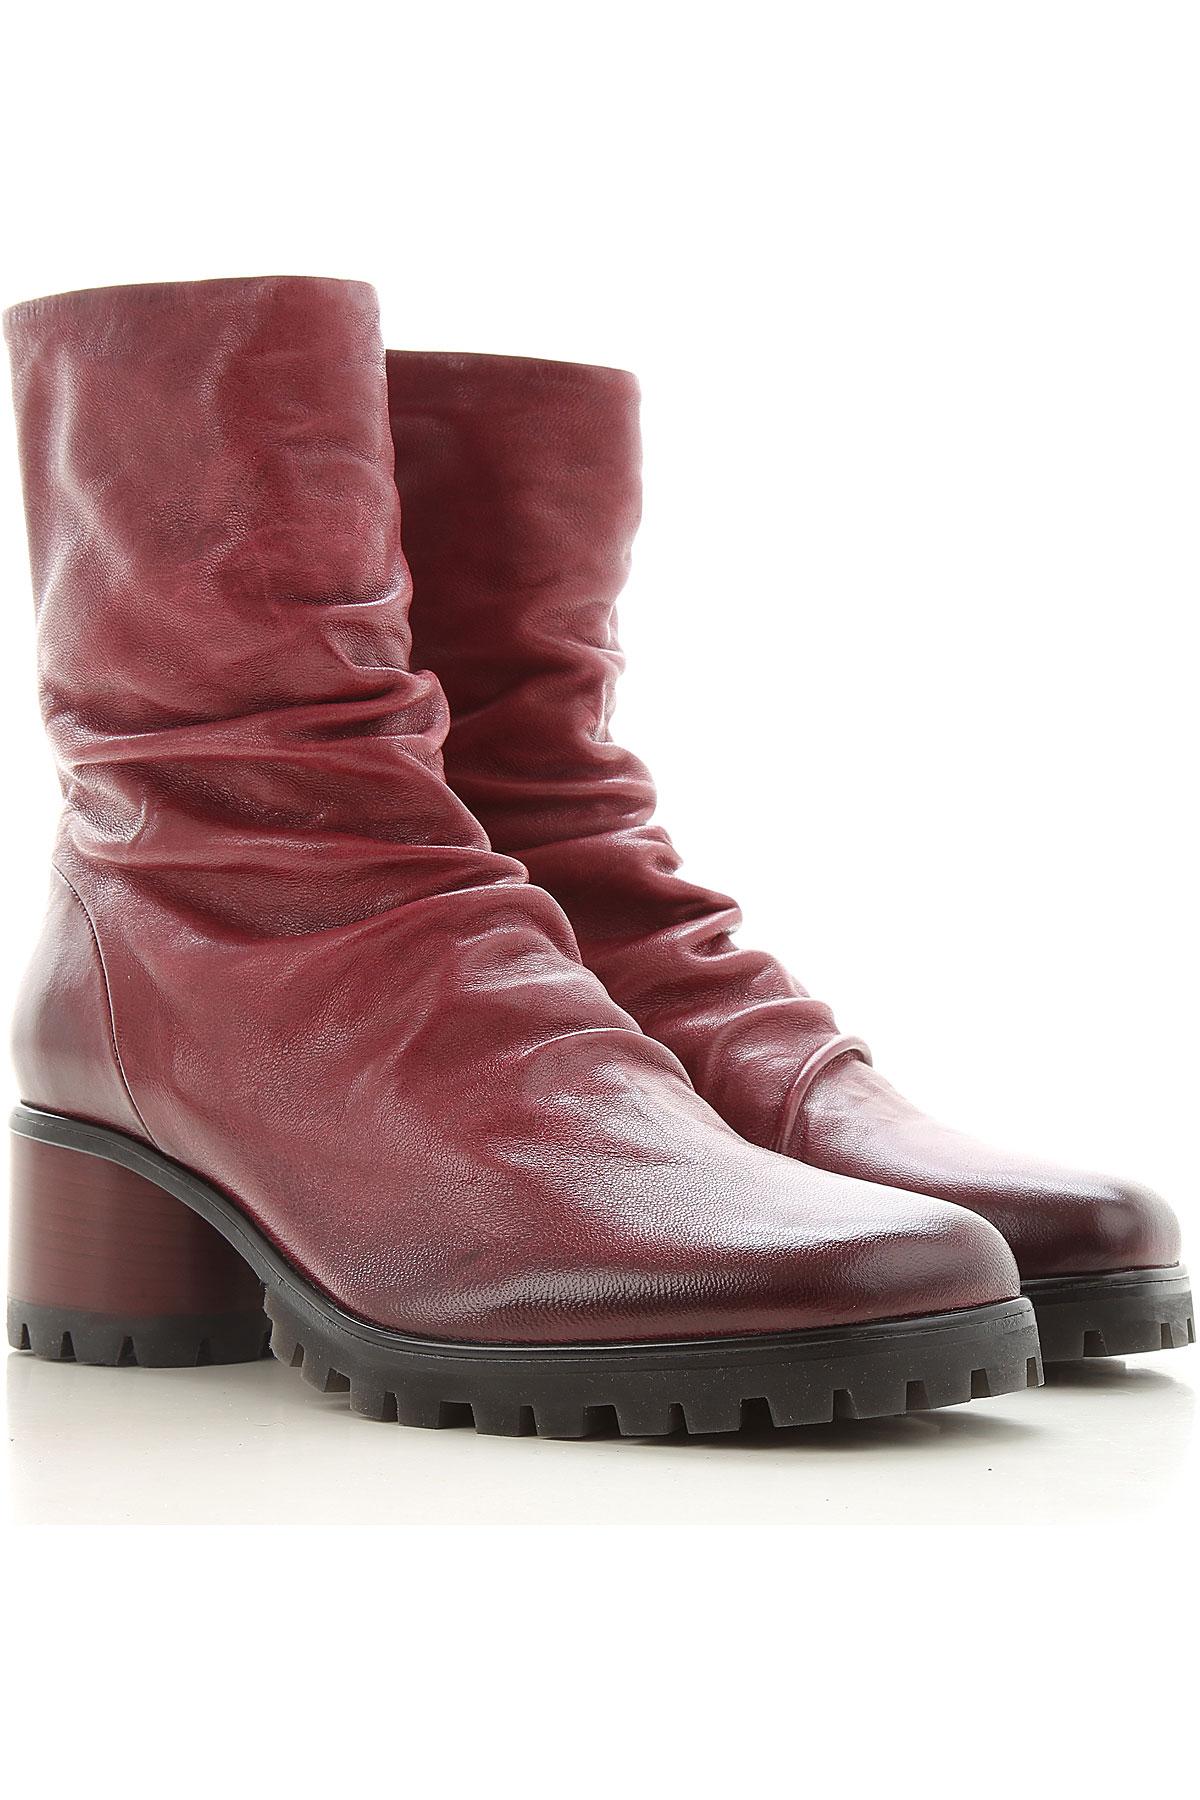 Halmanera Boots for Women, Booties, Bordeaux, Leather, 2019, 6 7 8